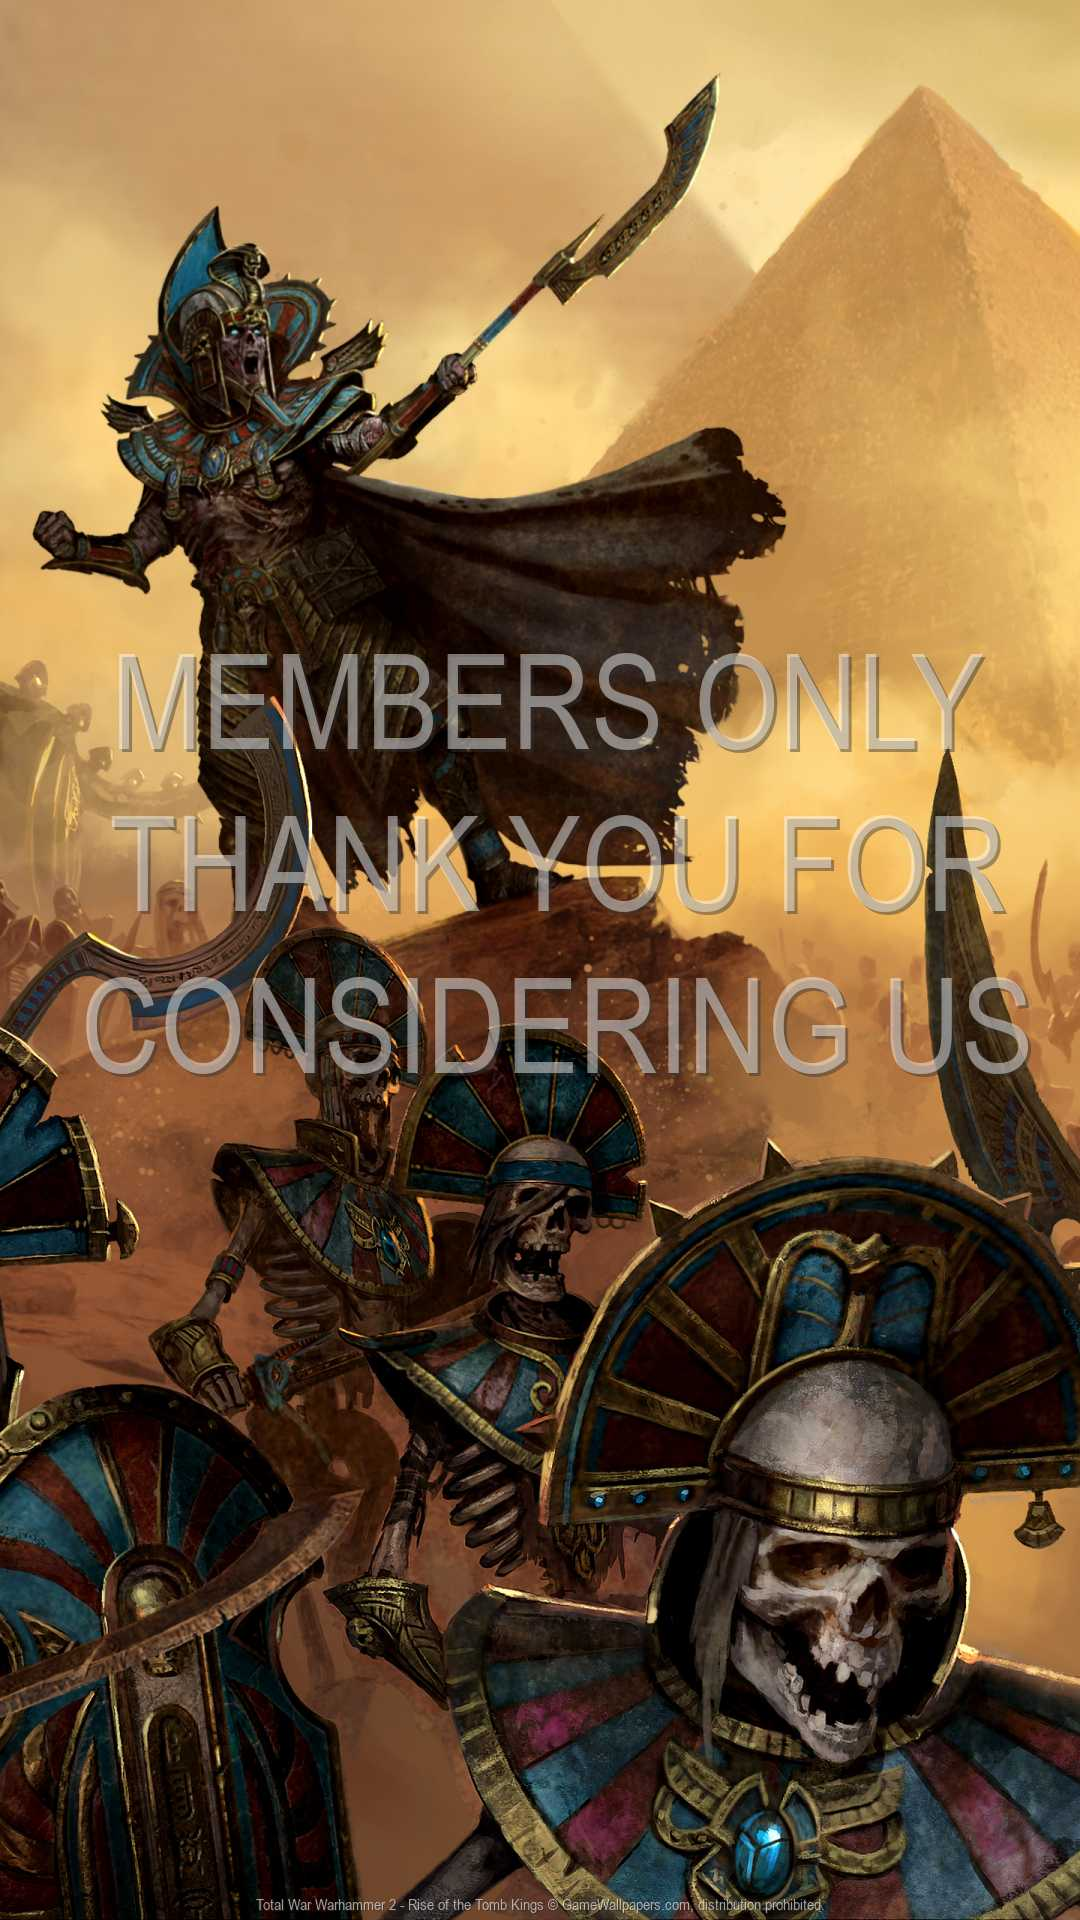 Total War: Warhammer 2 - Rise of the Tomb Kings 1080p Vertical Handy Hintergrundbild 01